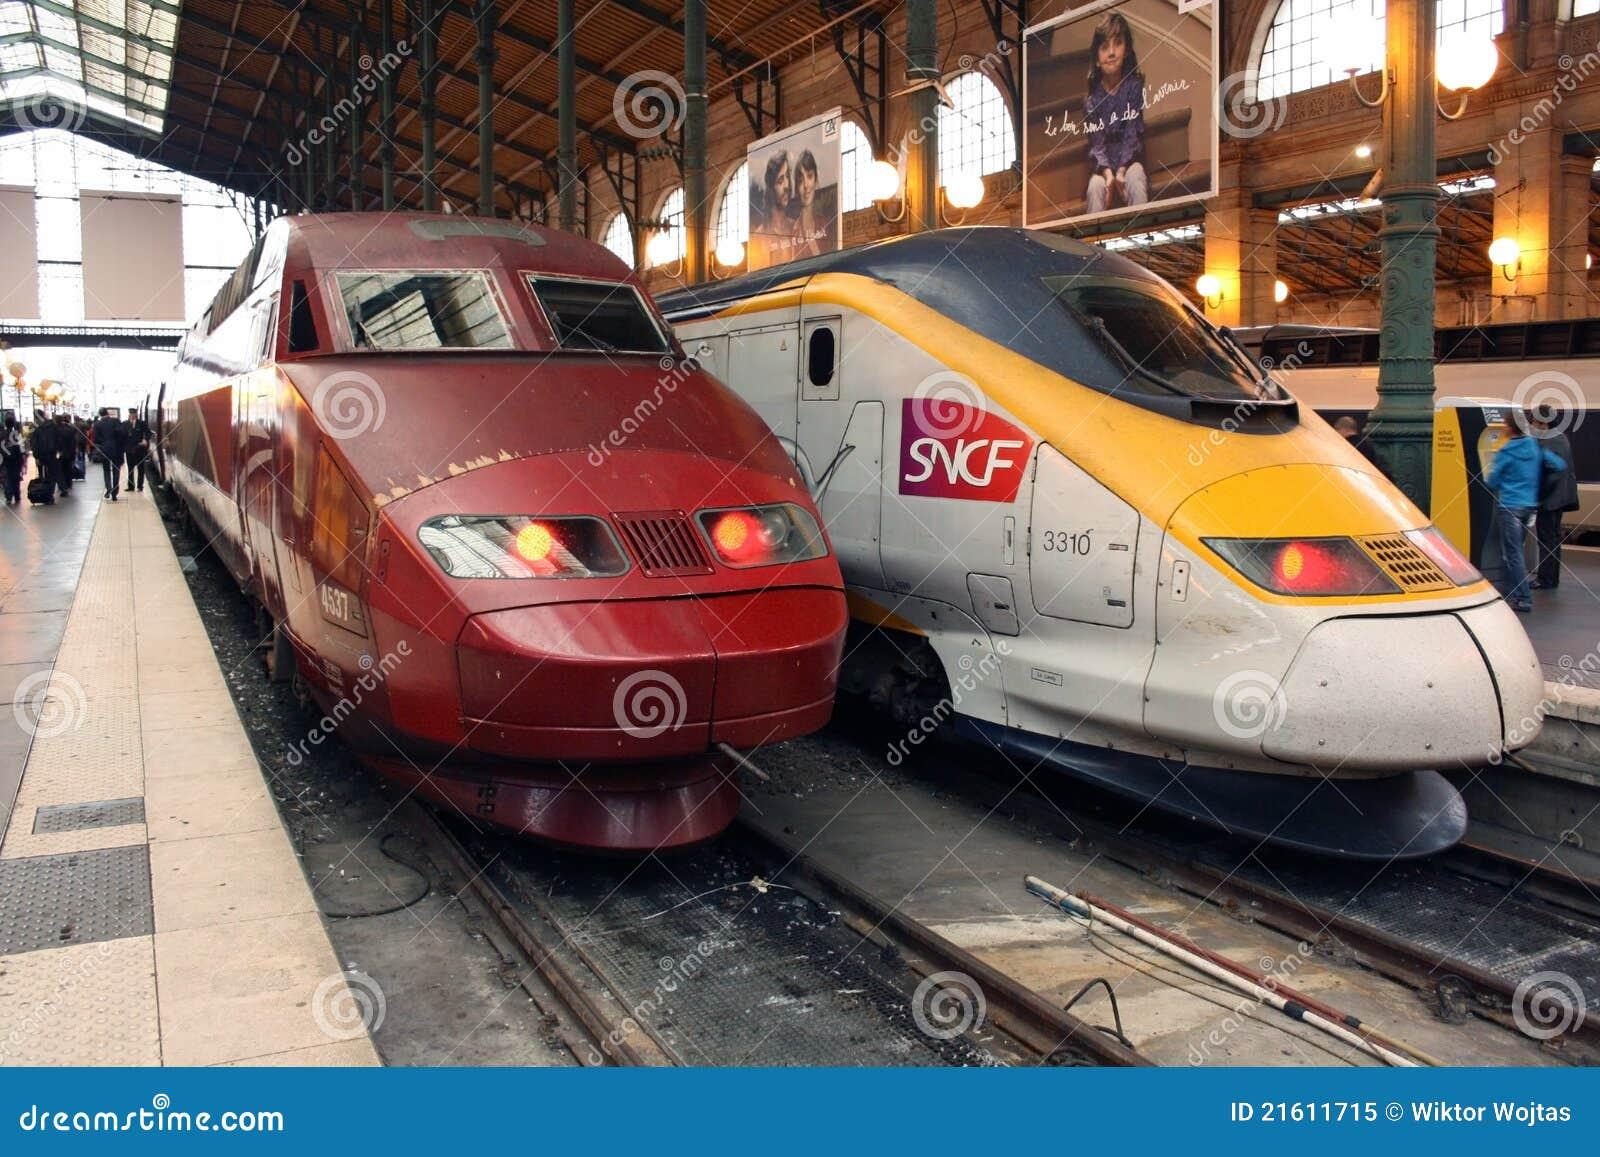 Wysocy Paris prędkości tgv thalys pociągi